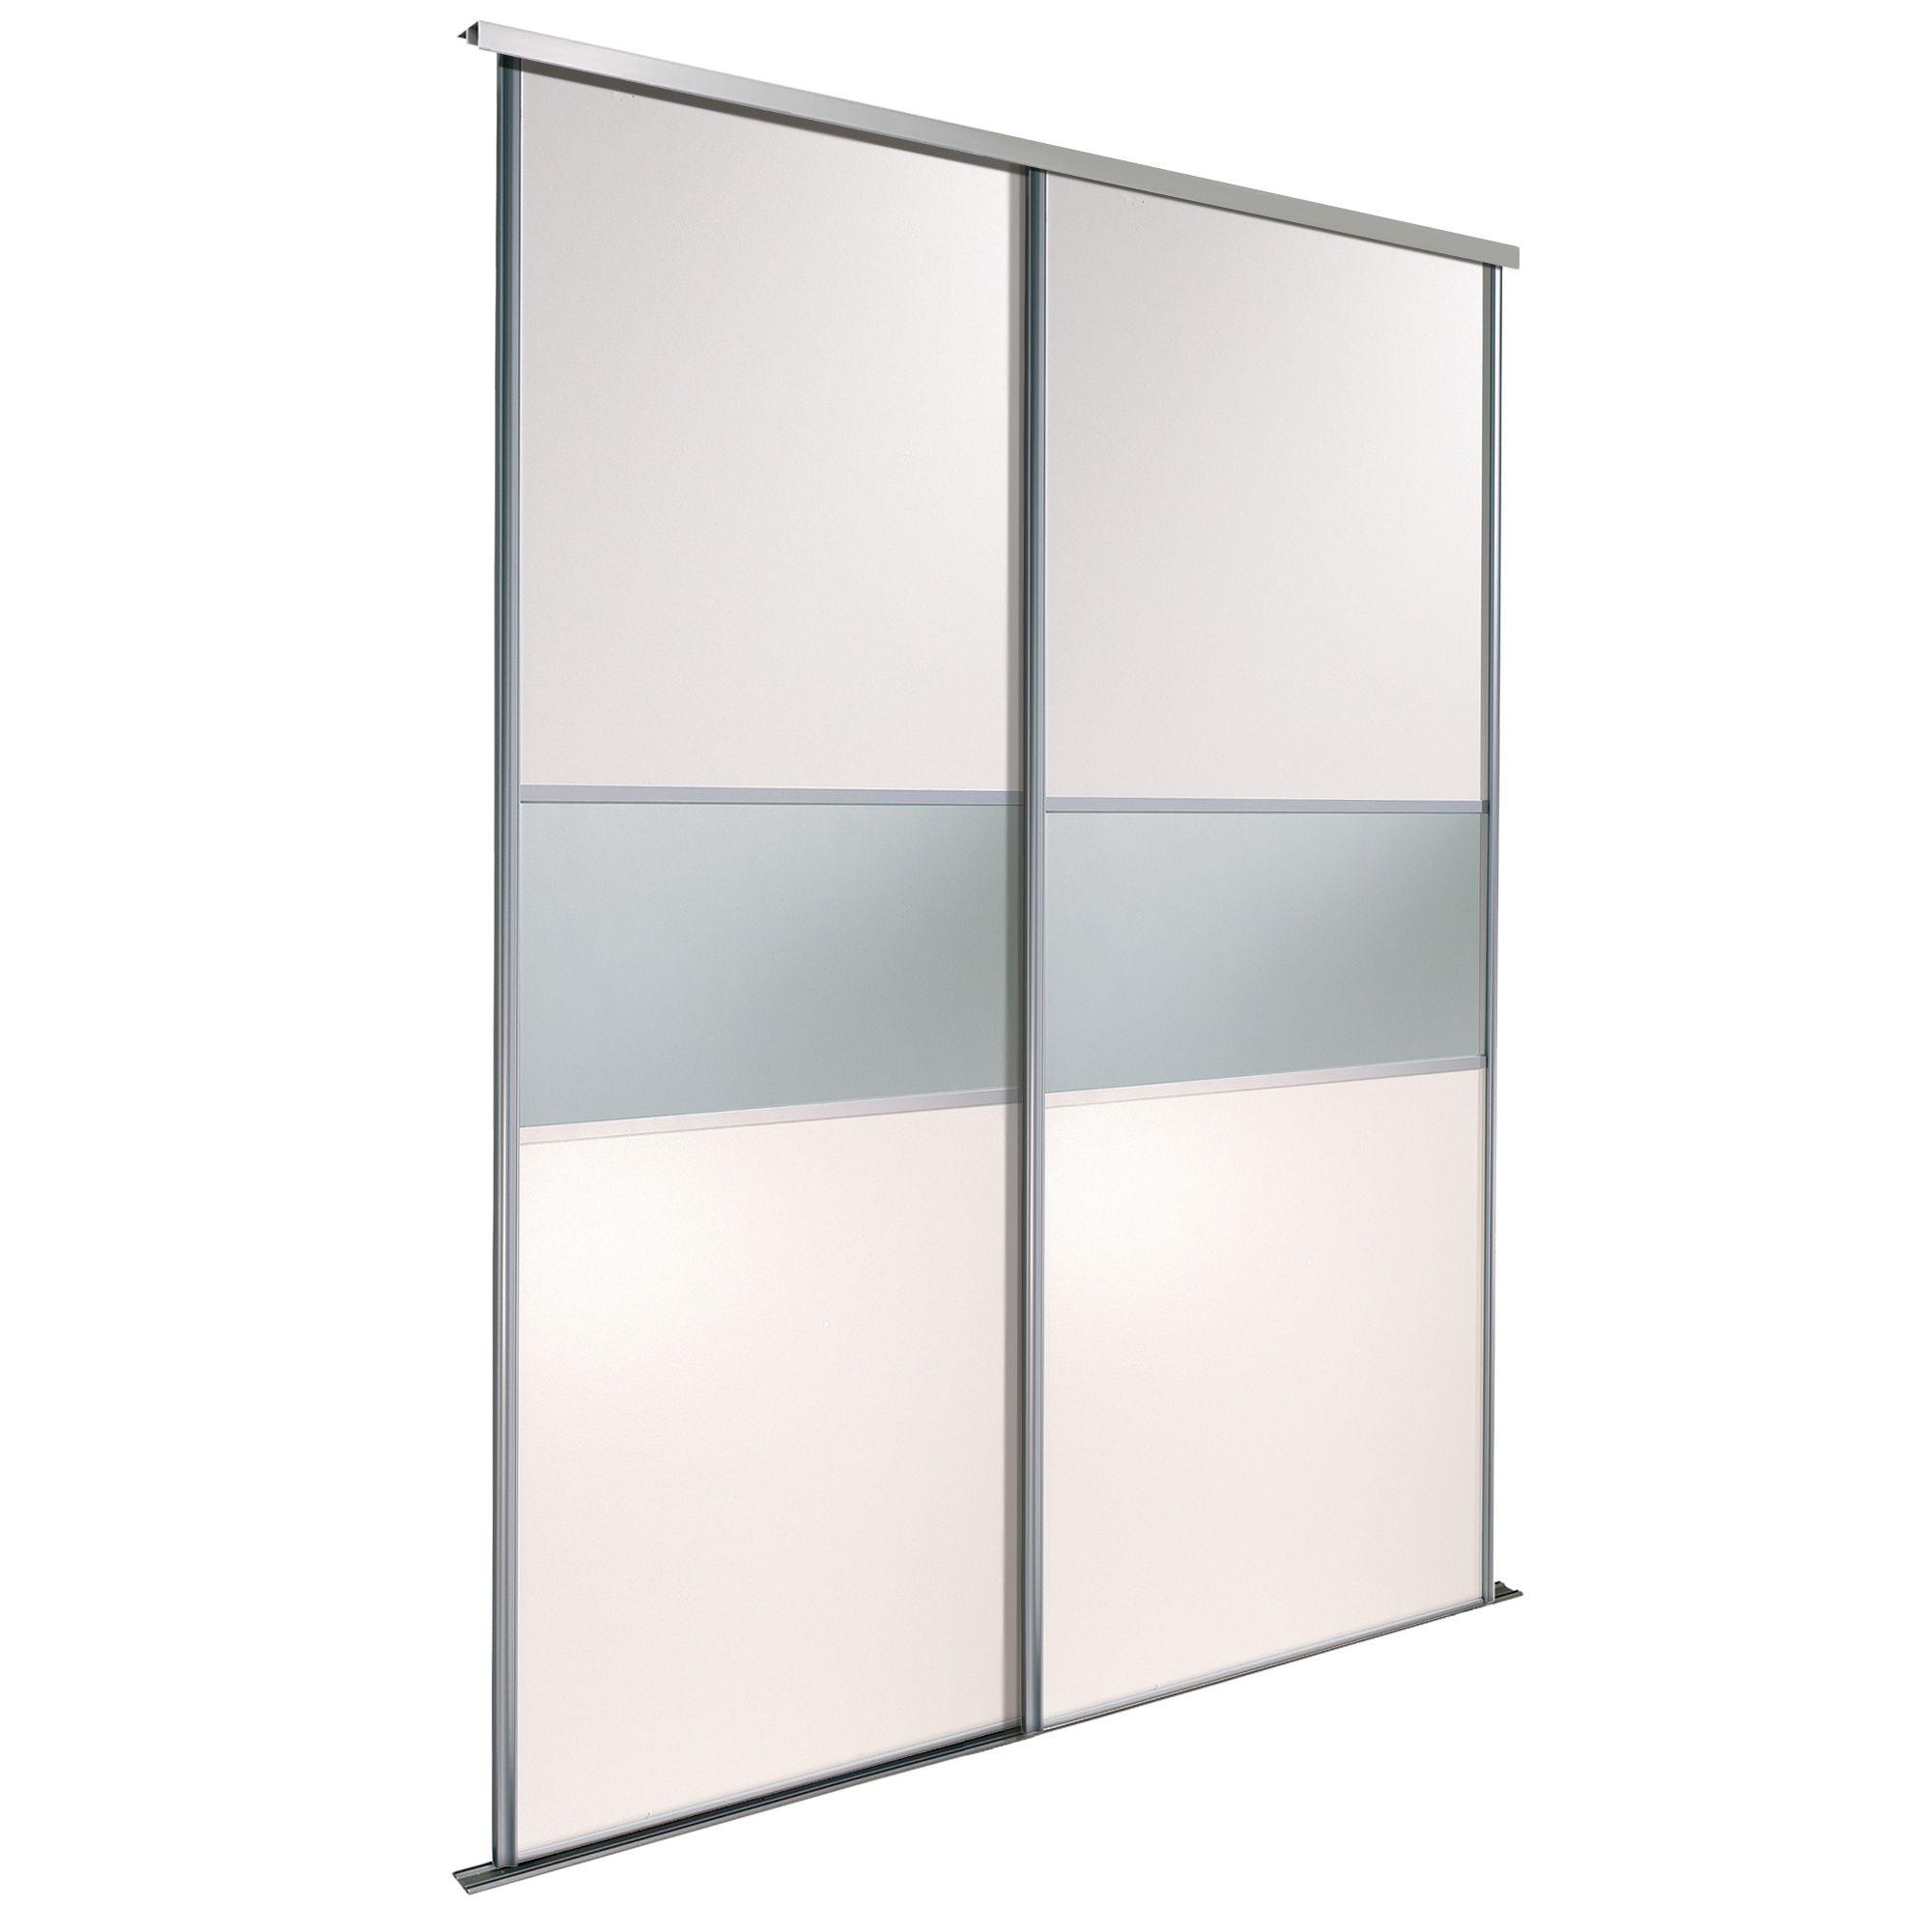 Bq bathroom mirrors with lights - Preisvergleich